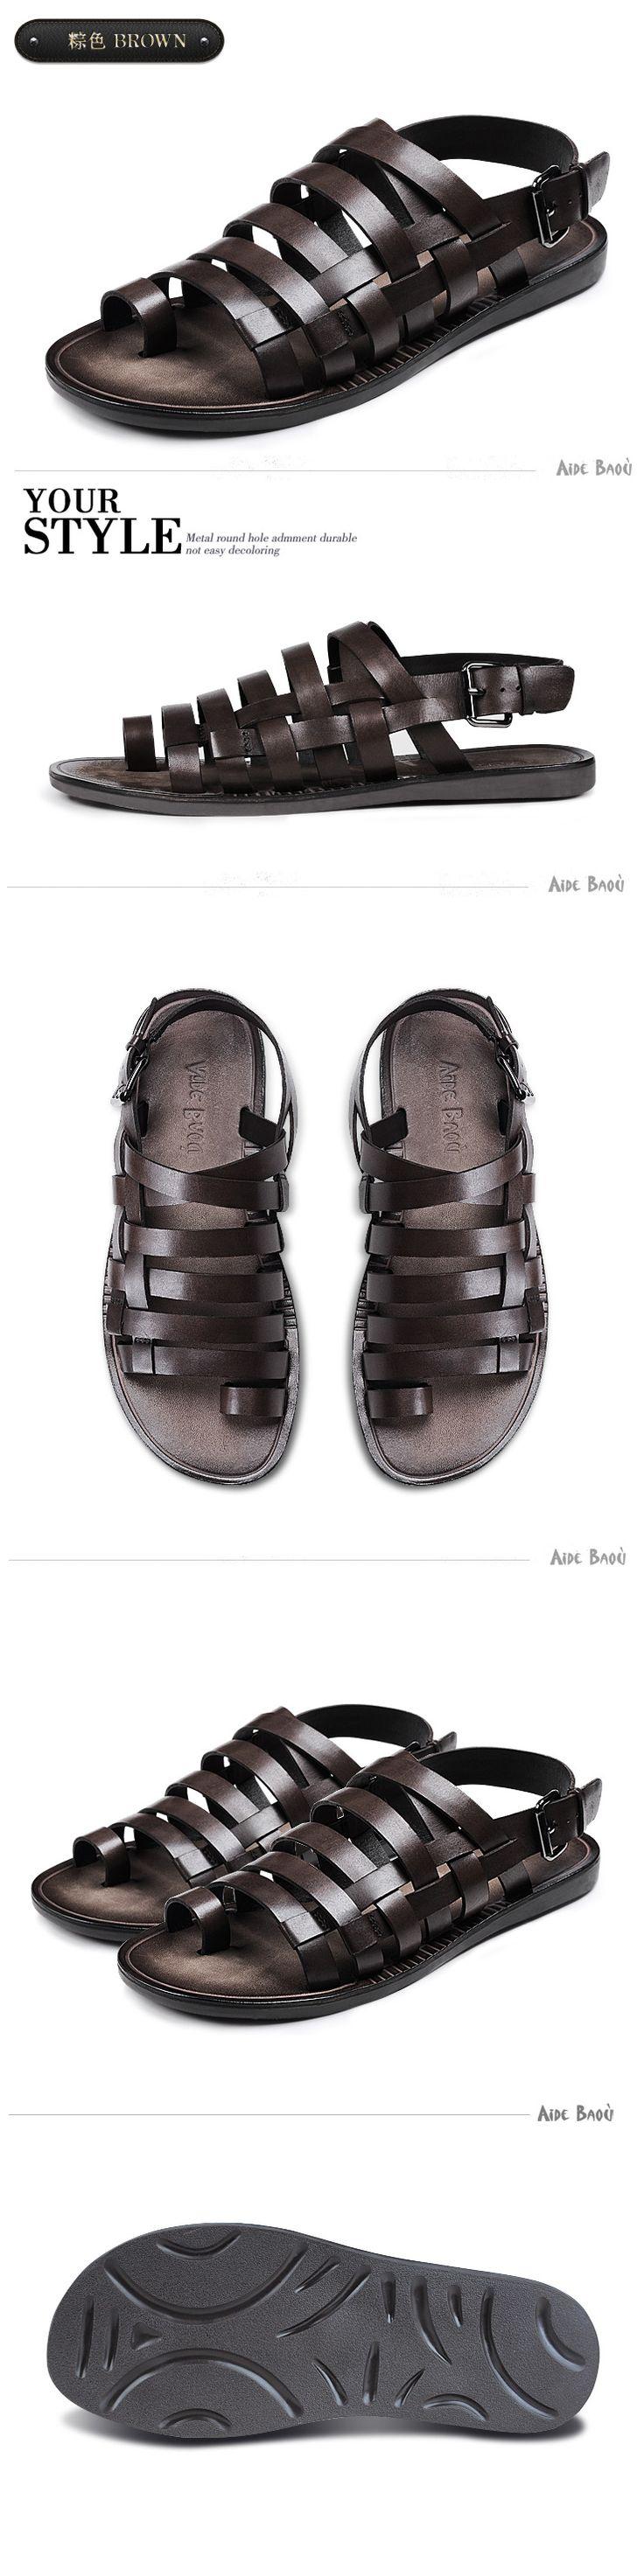 Black sandals asda - Mens Sandals Aide Badu Me Gustan Mucho Estas Sandalias En Este Color